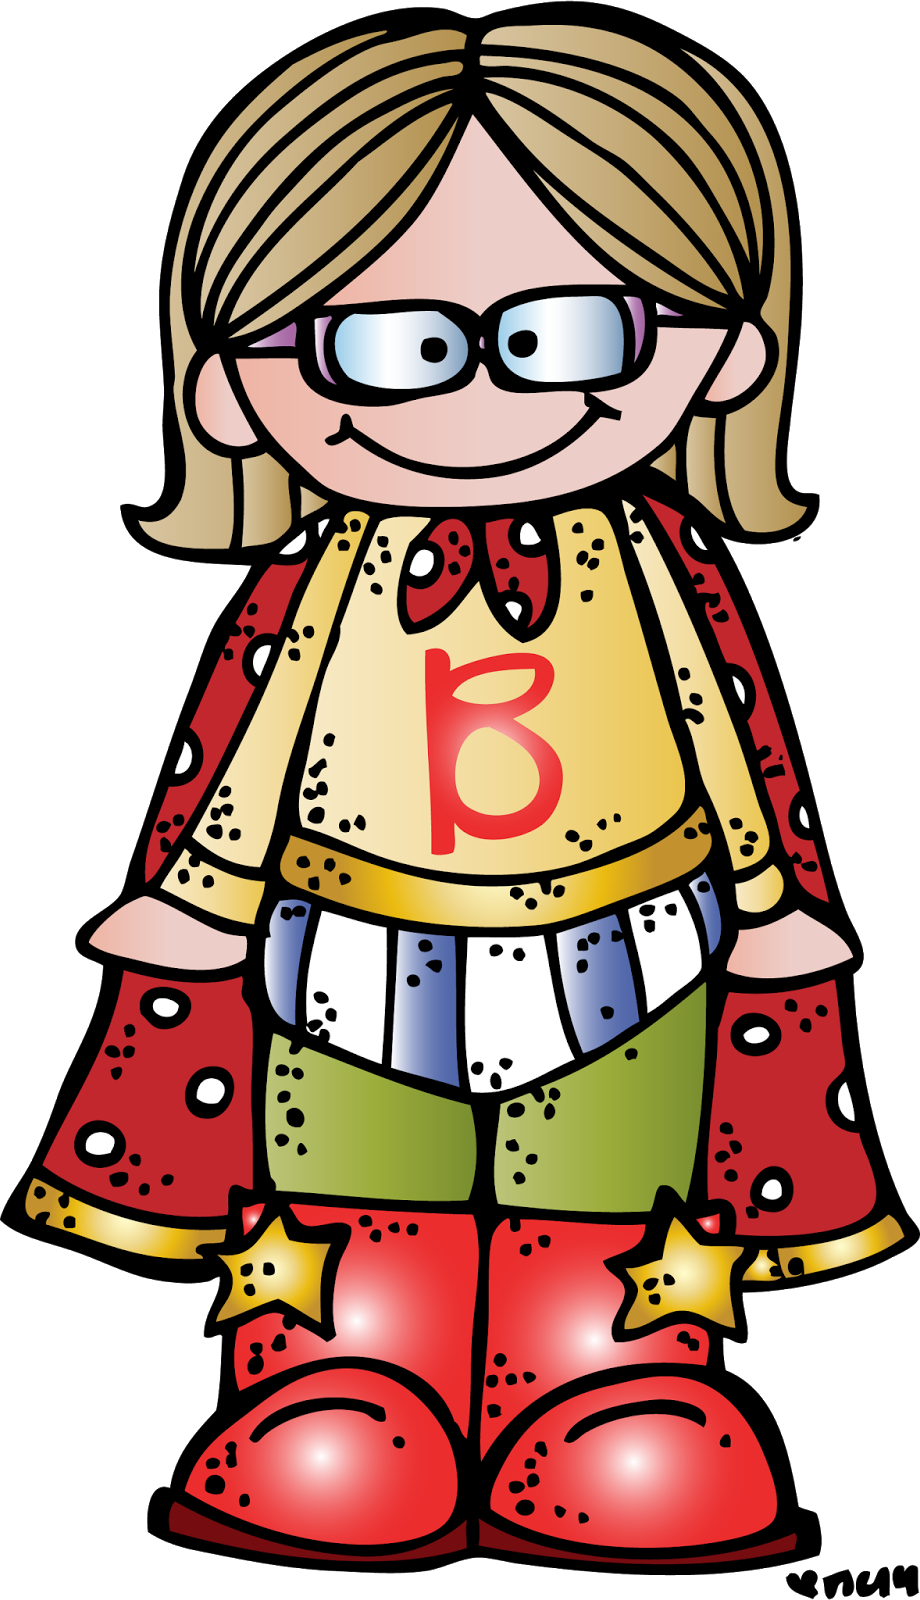 Melonheadz star wars dress up clipart clip royalty free MelonHeadz: Meet Baylee!!! clip royalty free